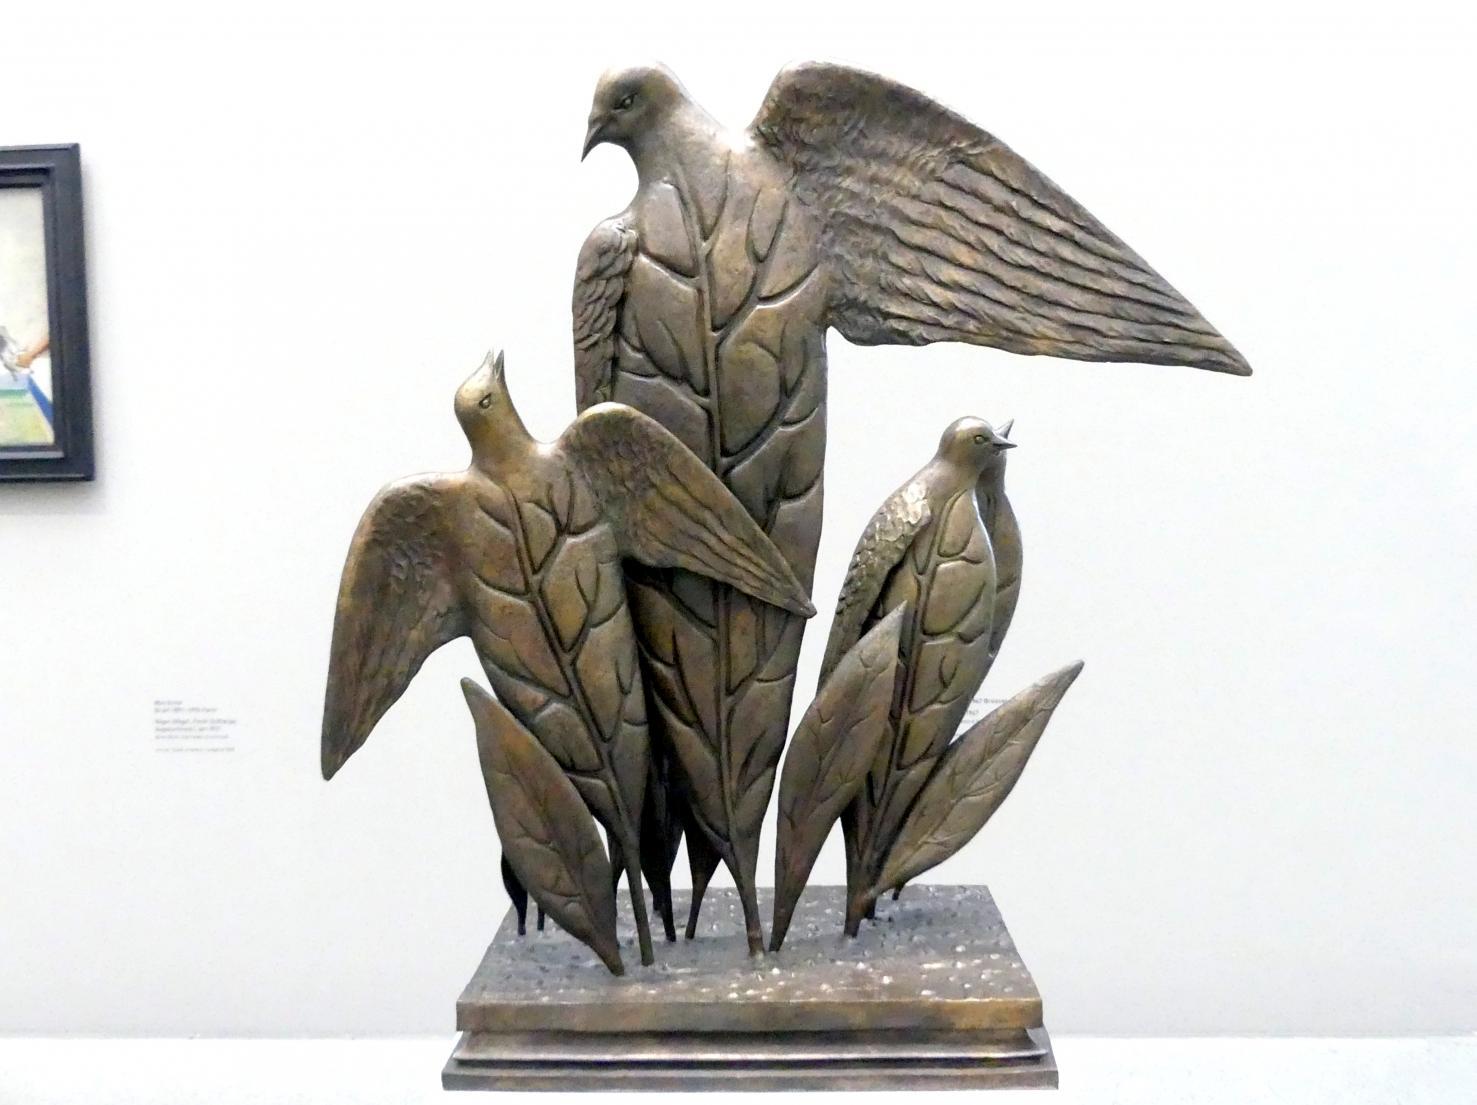 René Magritte: Les grâces naturelles - Die natürlichen Gnaden, 1967